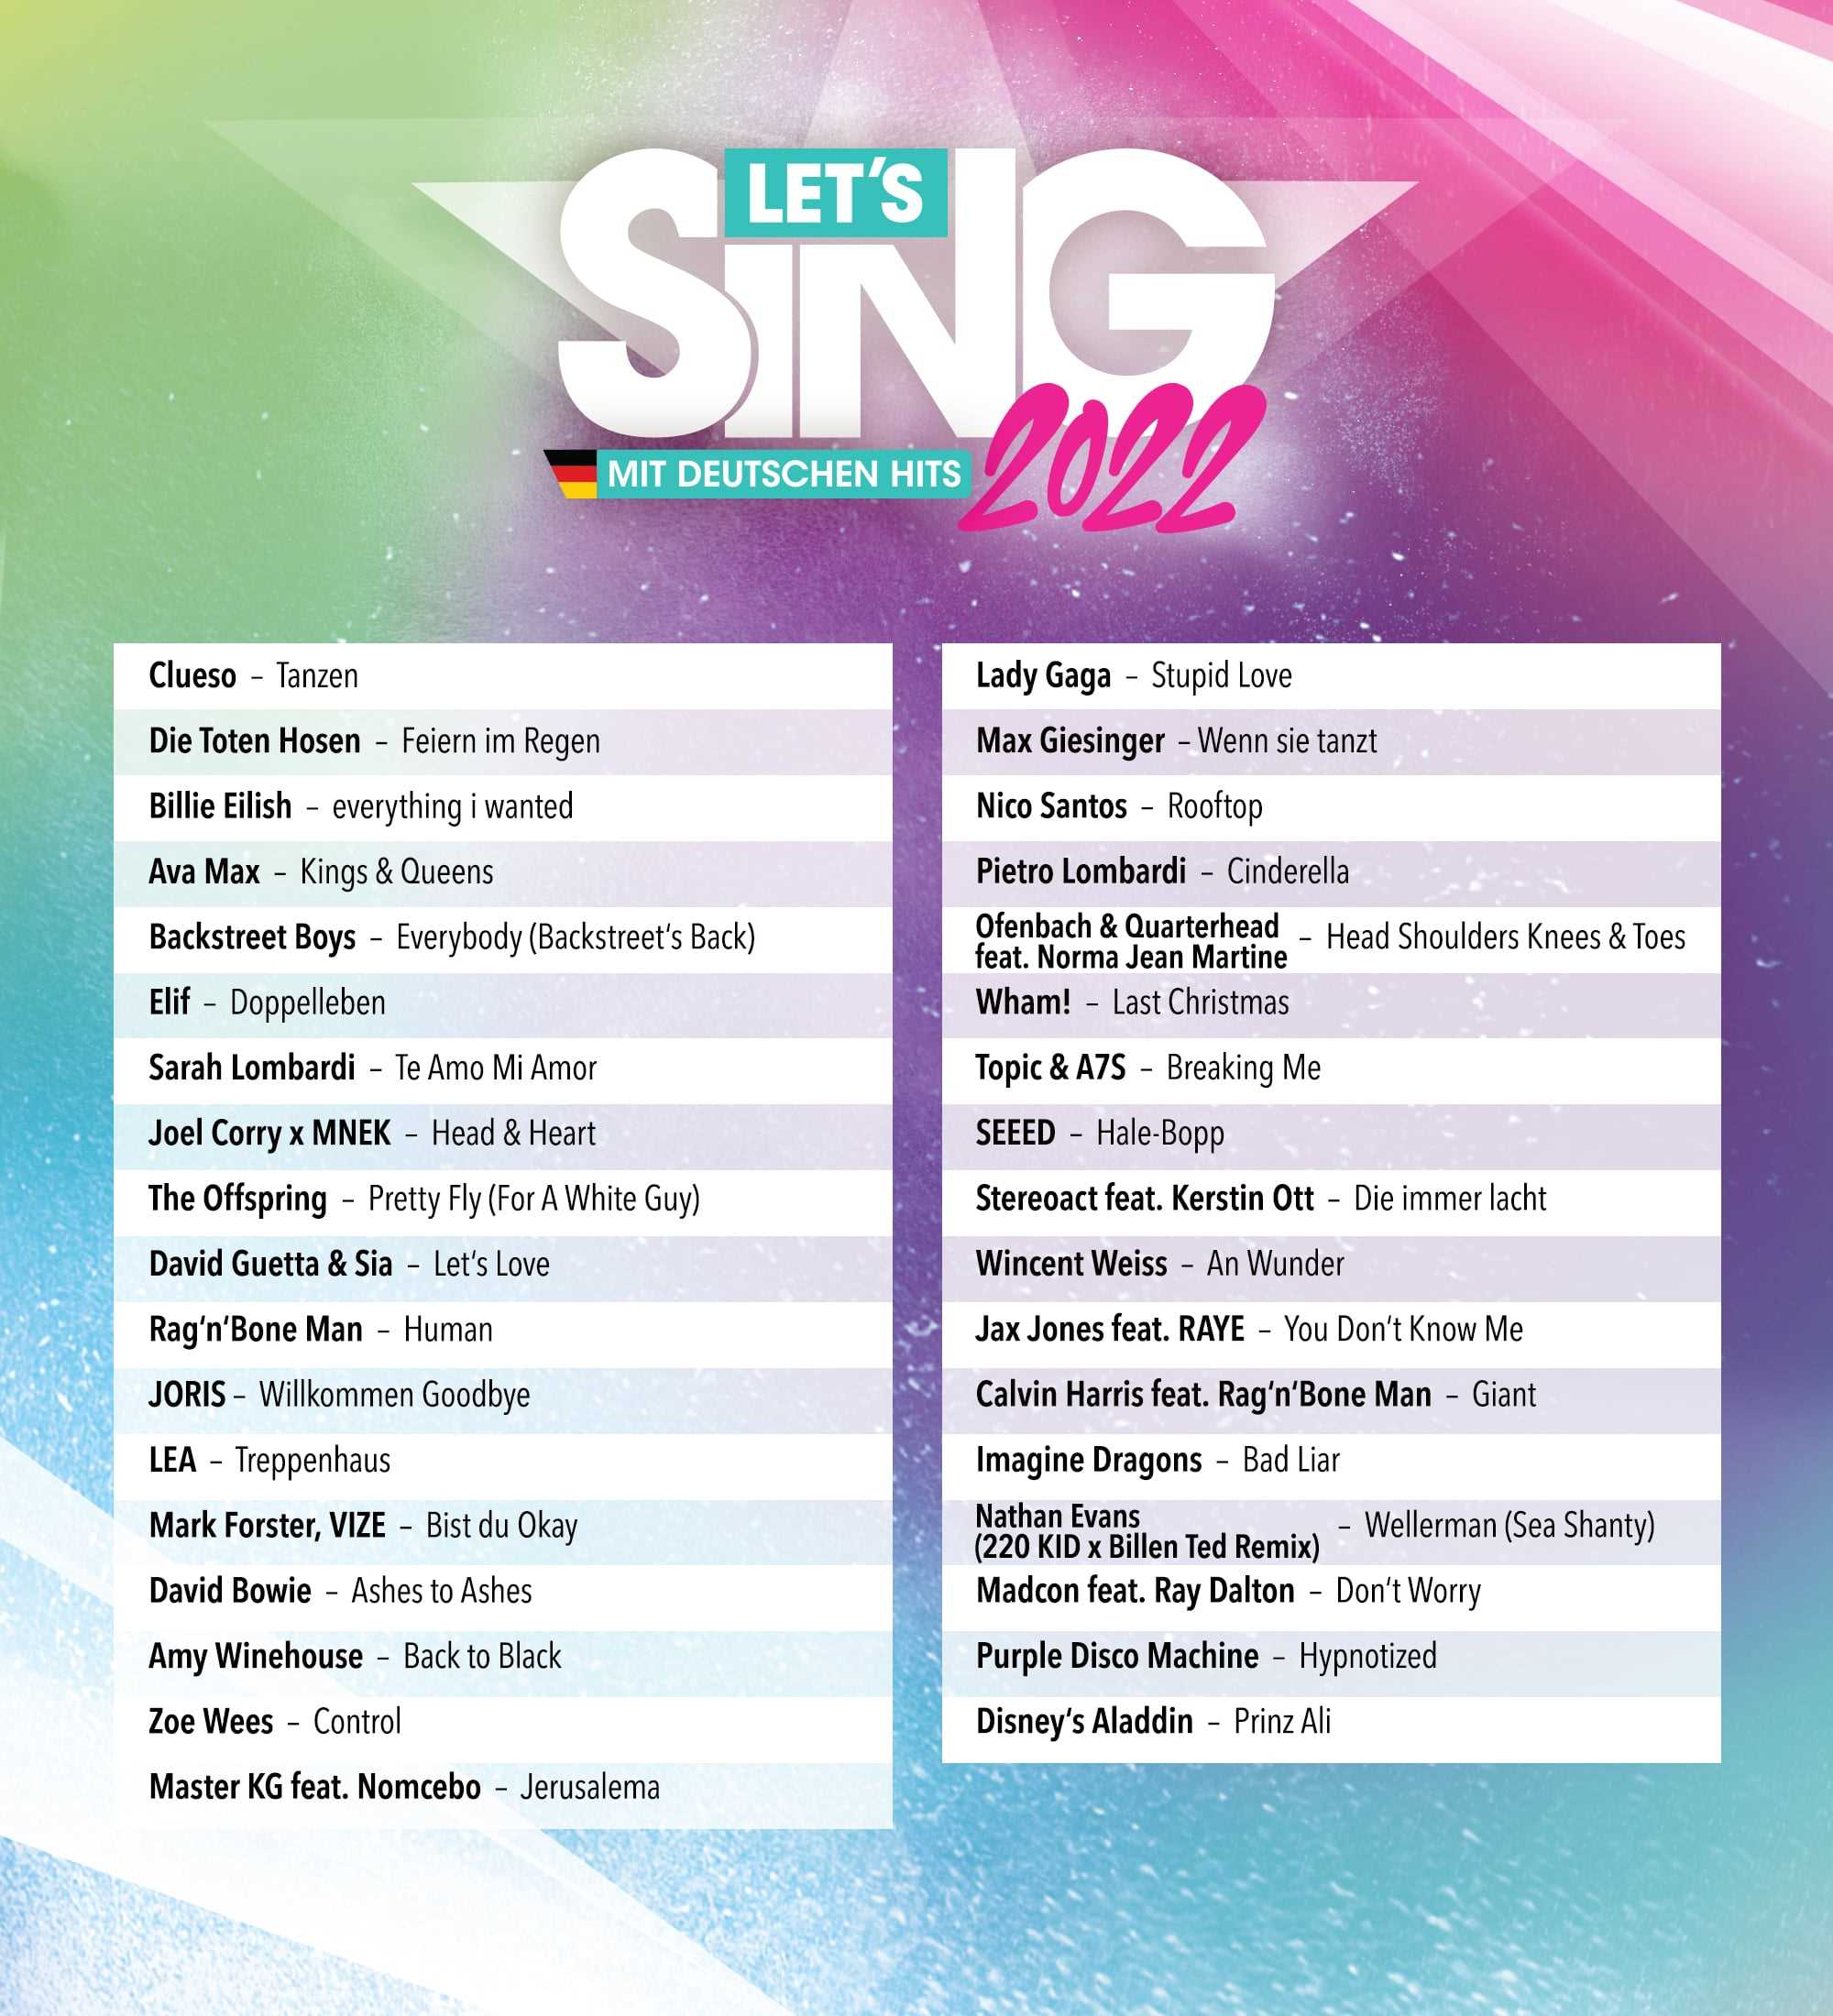 Let's Sing 2022 - Set list